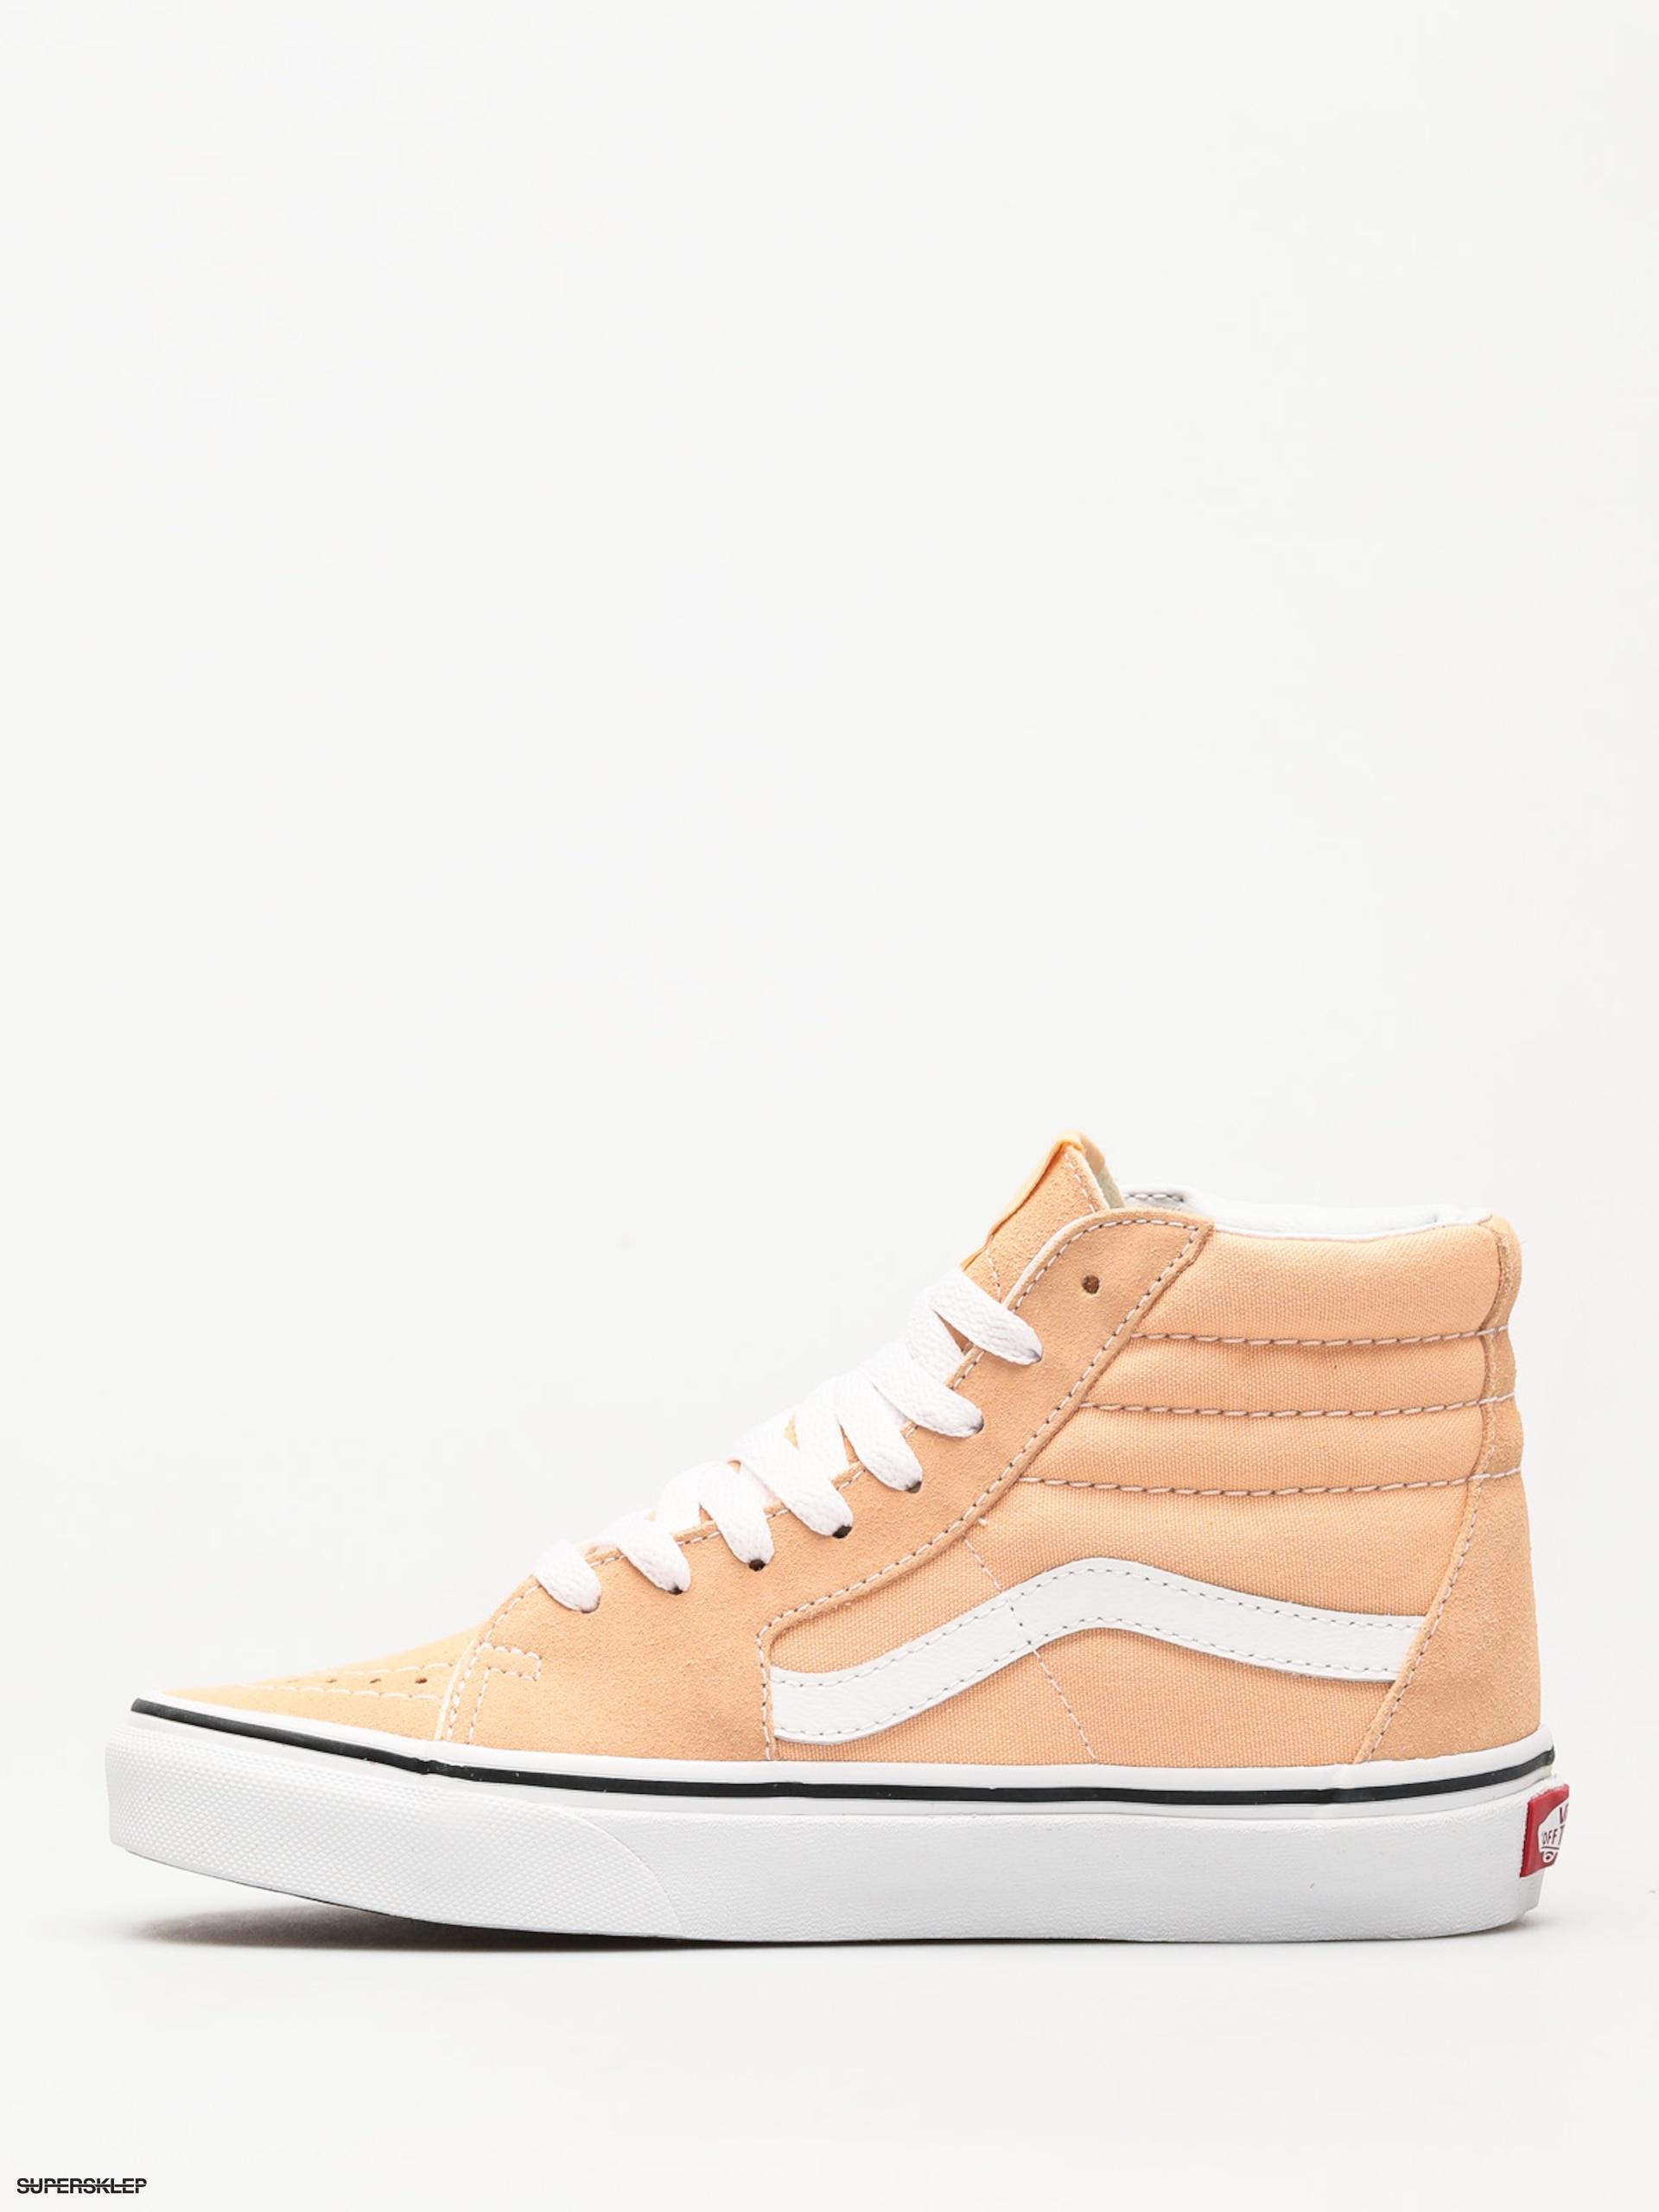 83f4017e45 Buty Vans Sk8 Hi (bleached apricot true white)